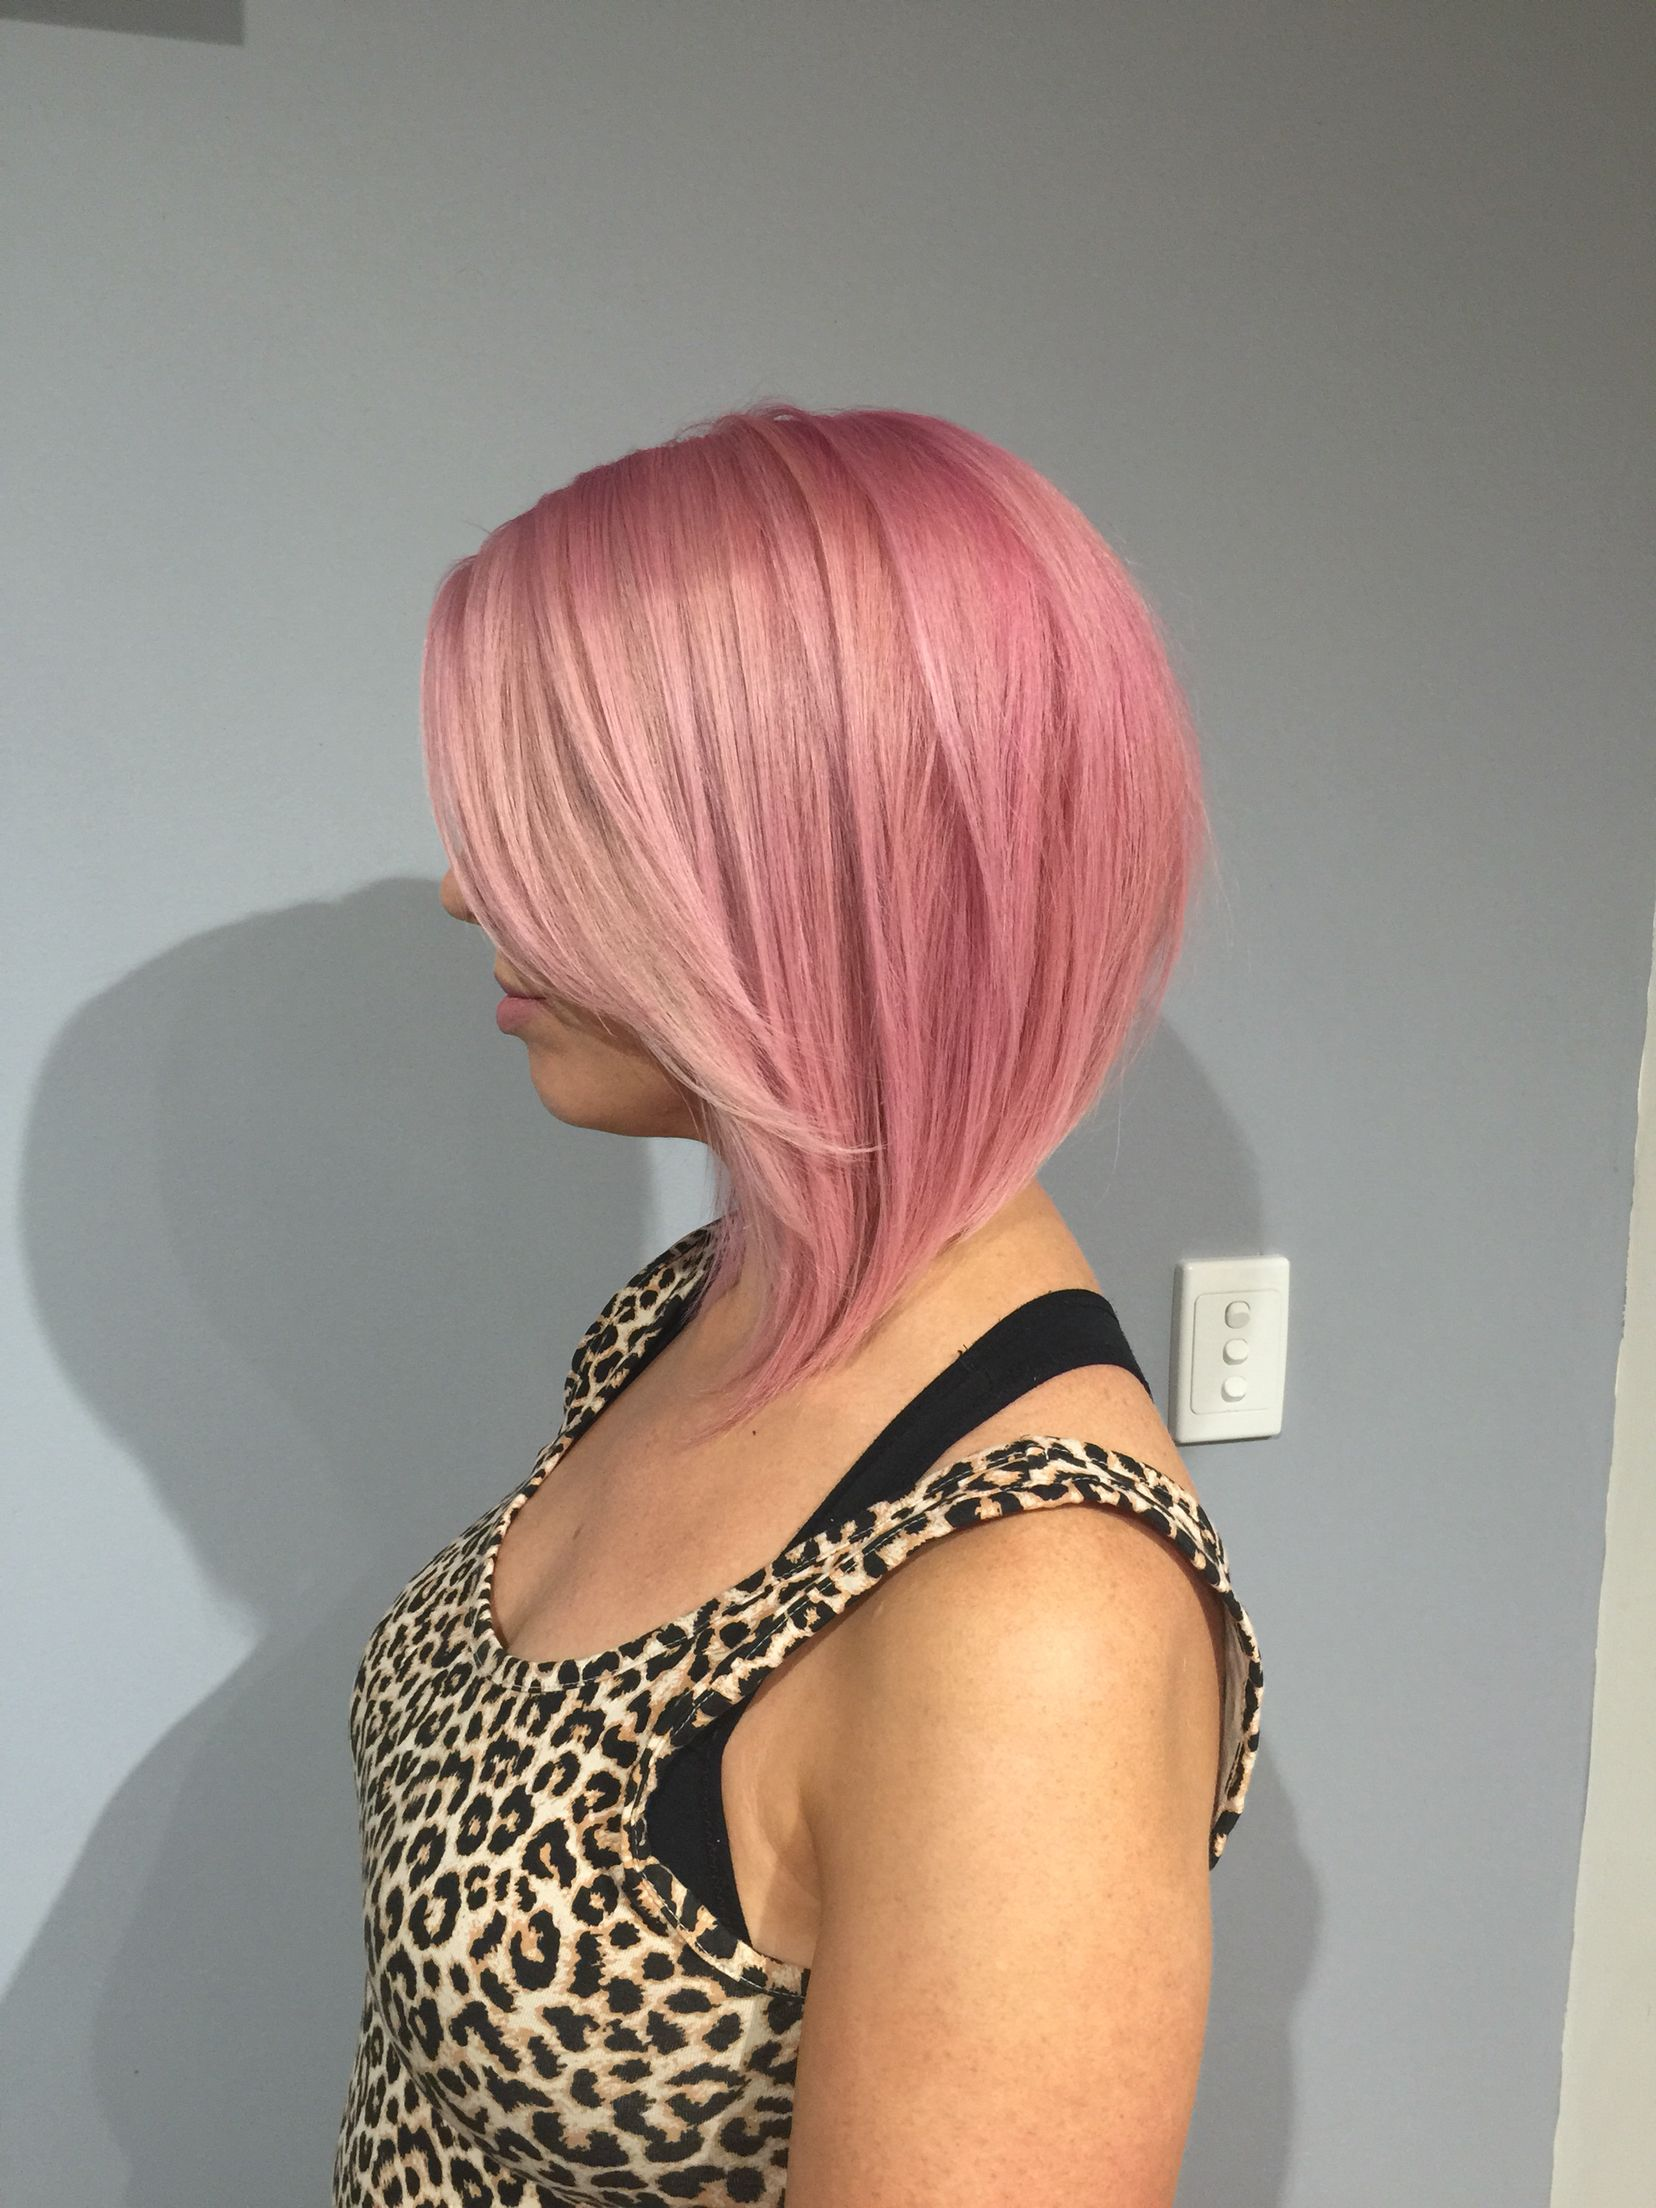 Pastel Pink Concave Bob Hairstyle Concave Bob Hairstyles Bob Hairstyles Concave Hairstyle